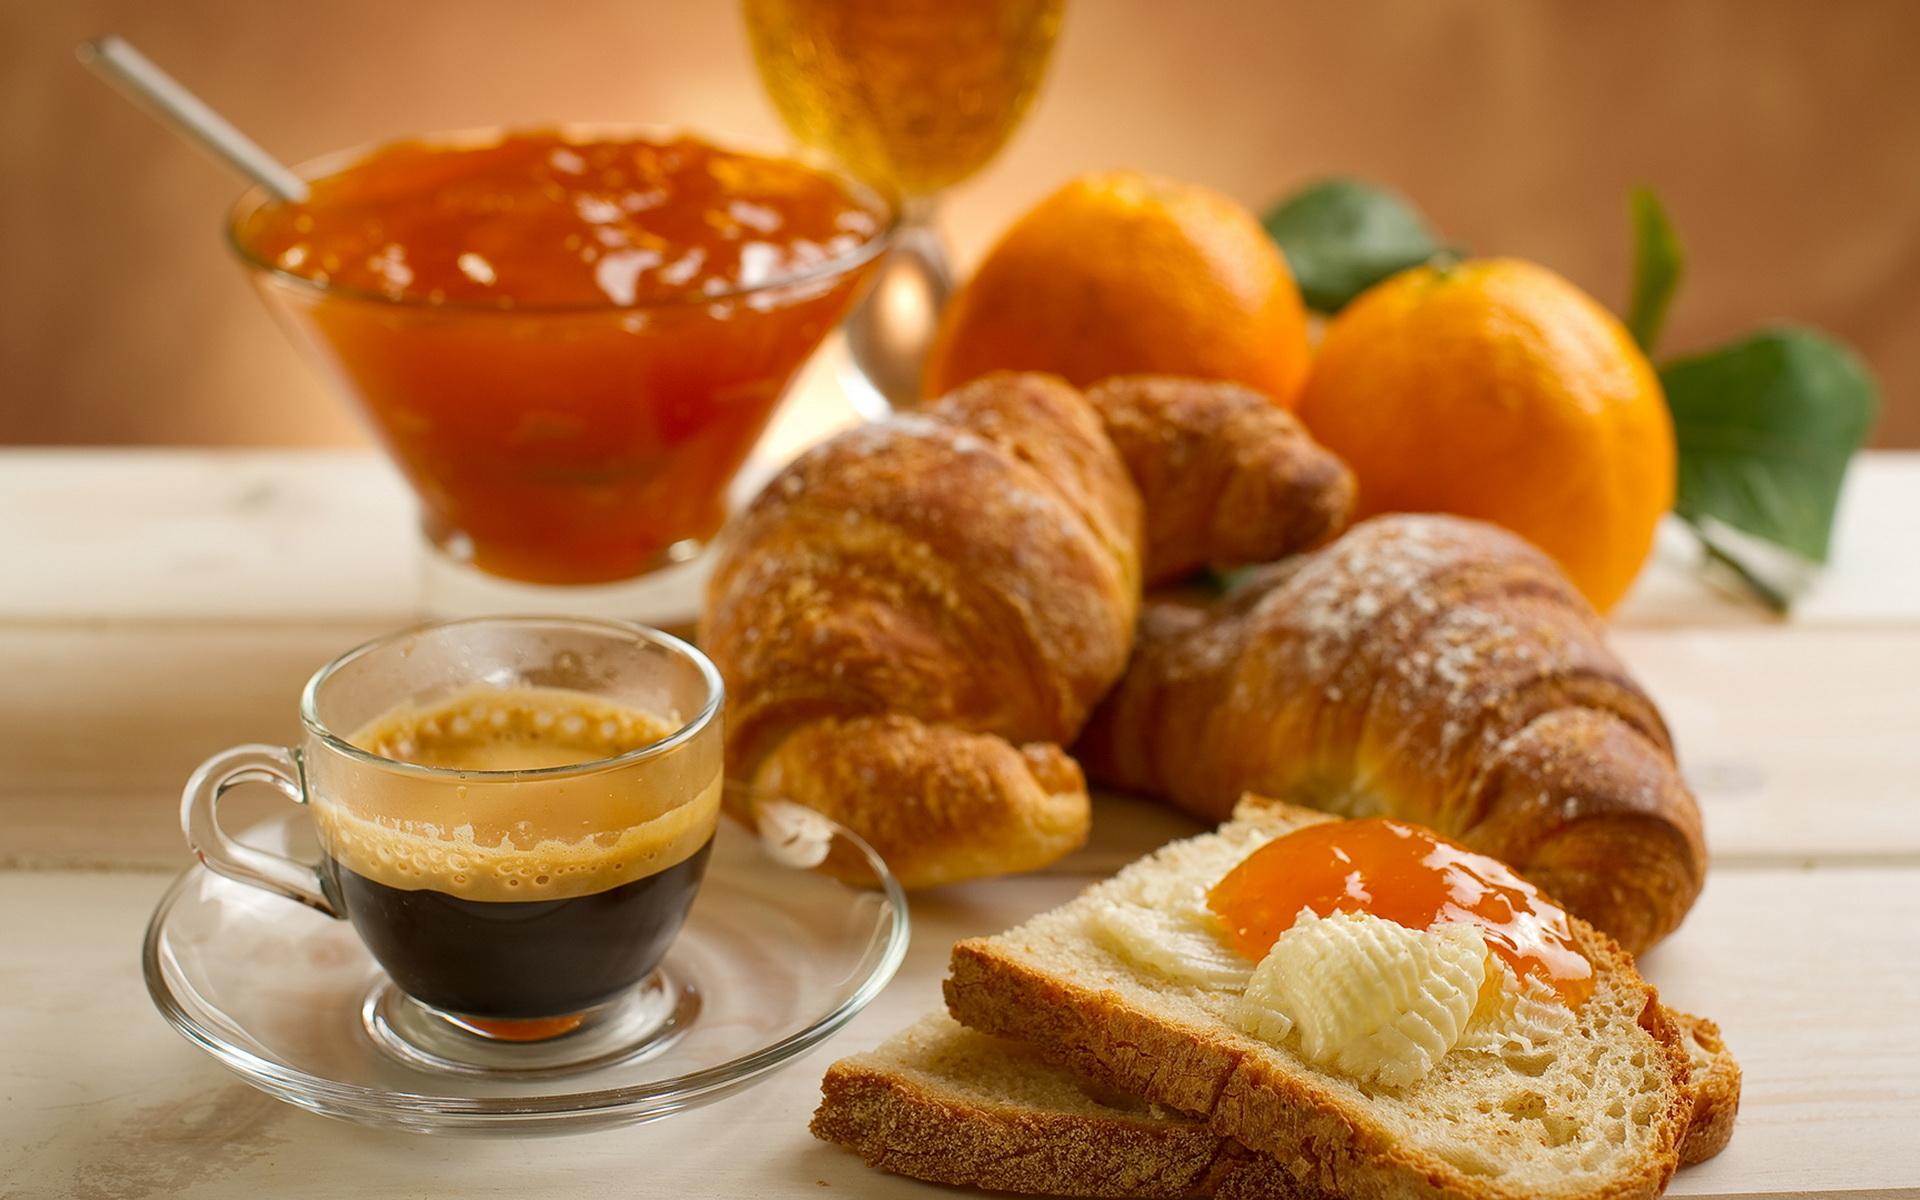 http://www.zastavki.com/pictures/1920x1200/2011/Food_Differring_meal_Tasty_breakfast_027162_.jpg